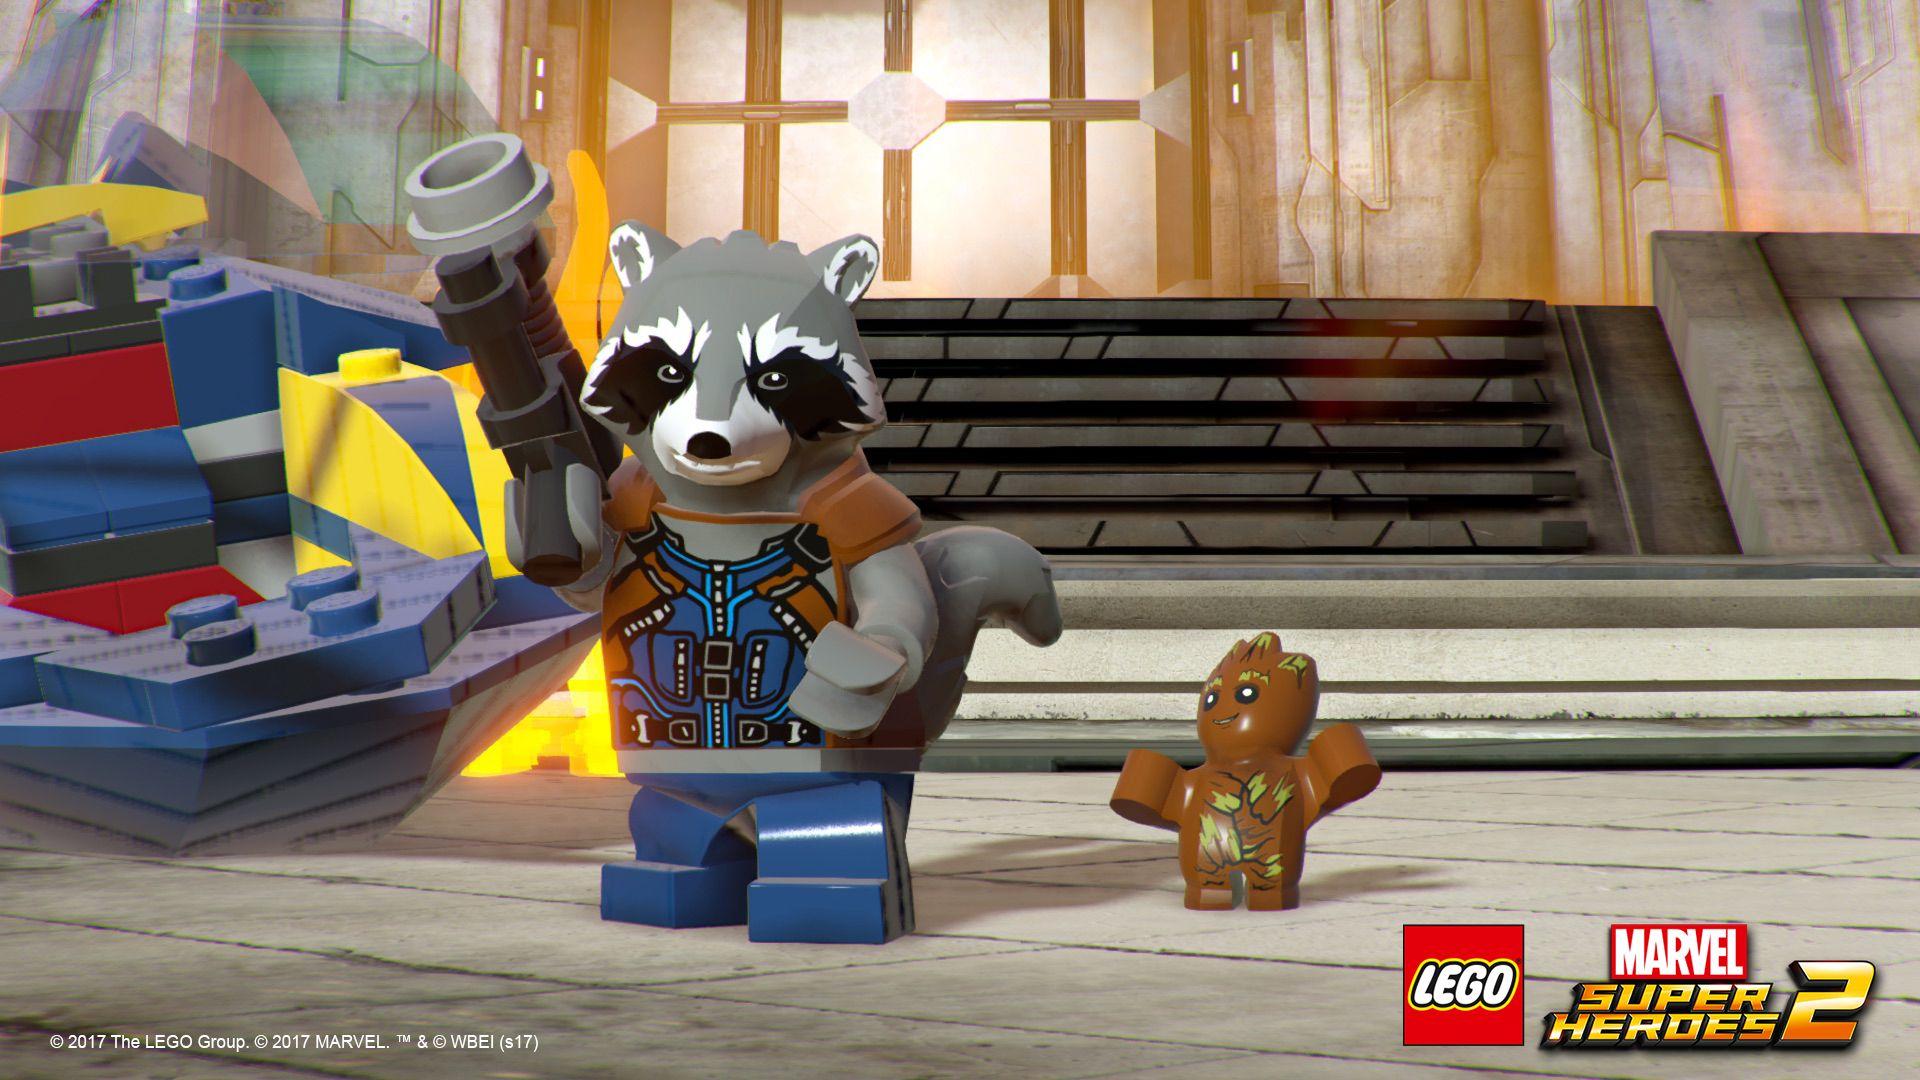 LEGO Marvel Super Heroes 2 (Nintendo Switch) - 5